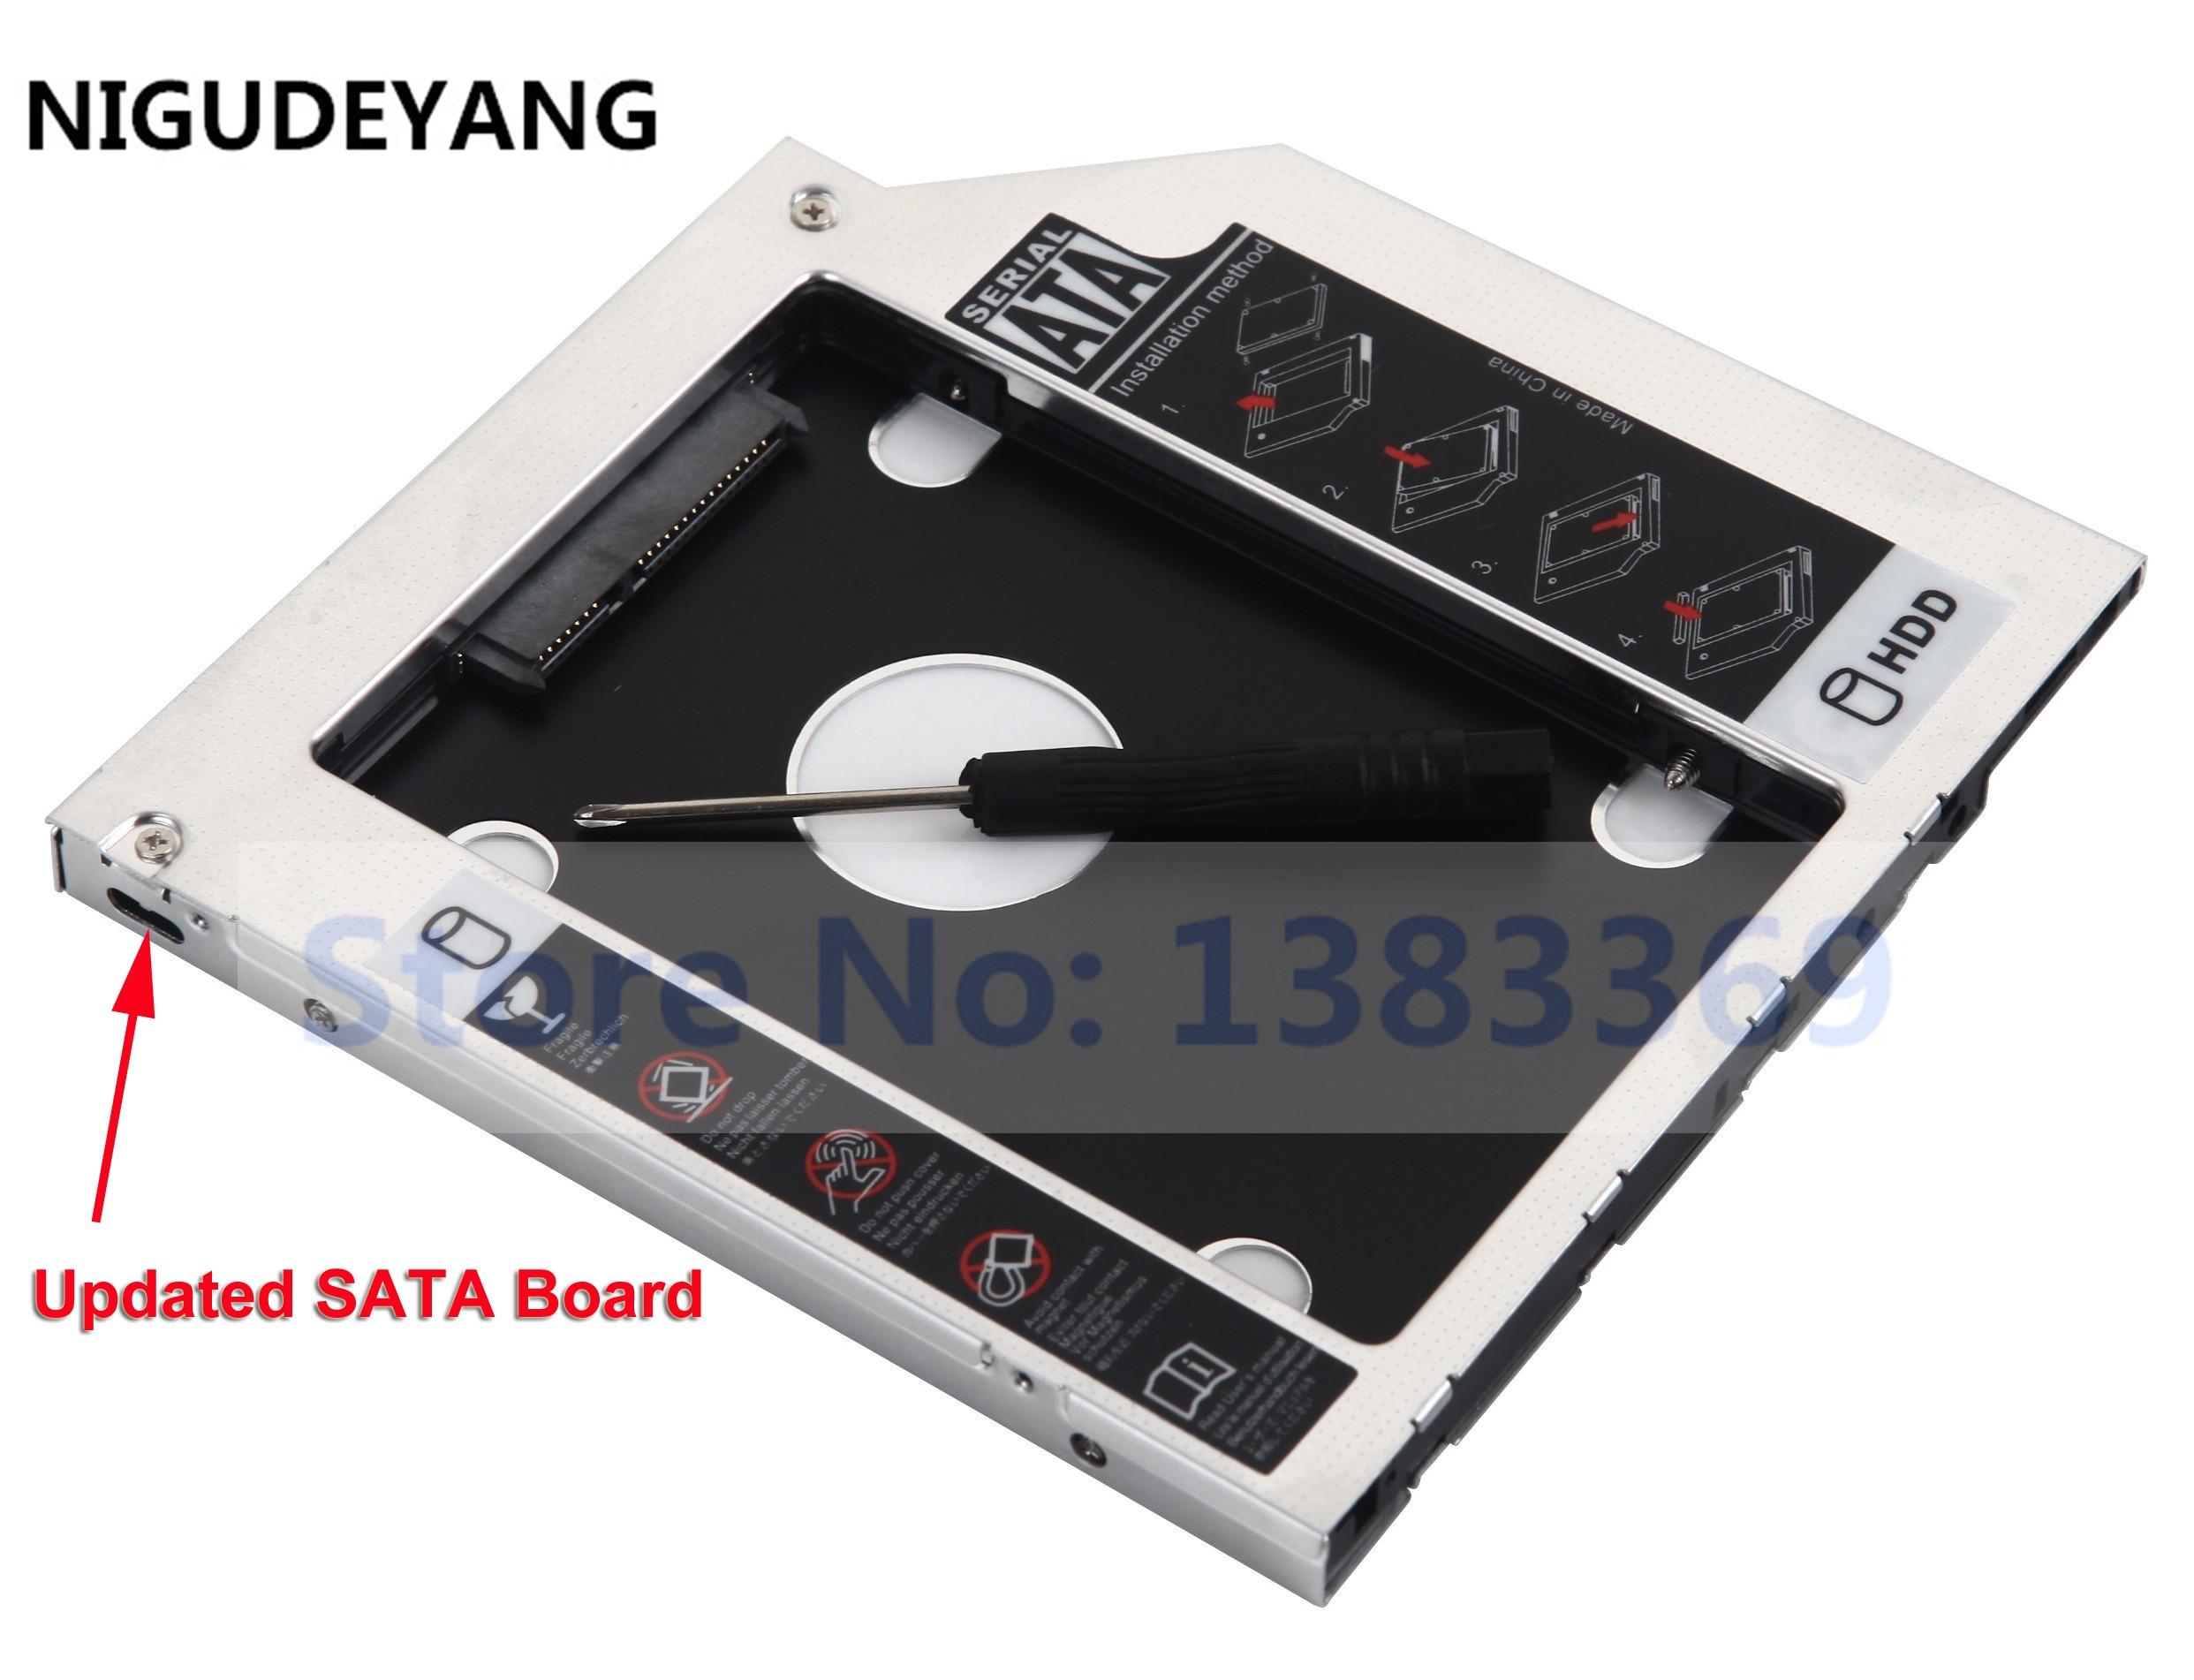 NIGUDEYANG 2ND HD SSD Festplatte SATA Caddy Adapter für Sony Vaio VPCS11X9E VPC-S11V9E AD-7930H DVD